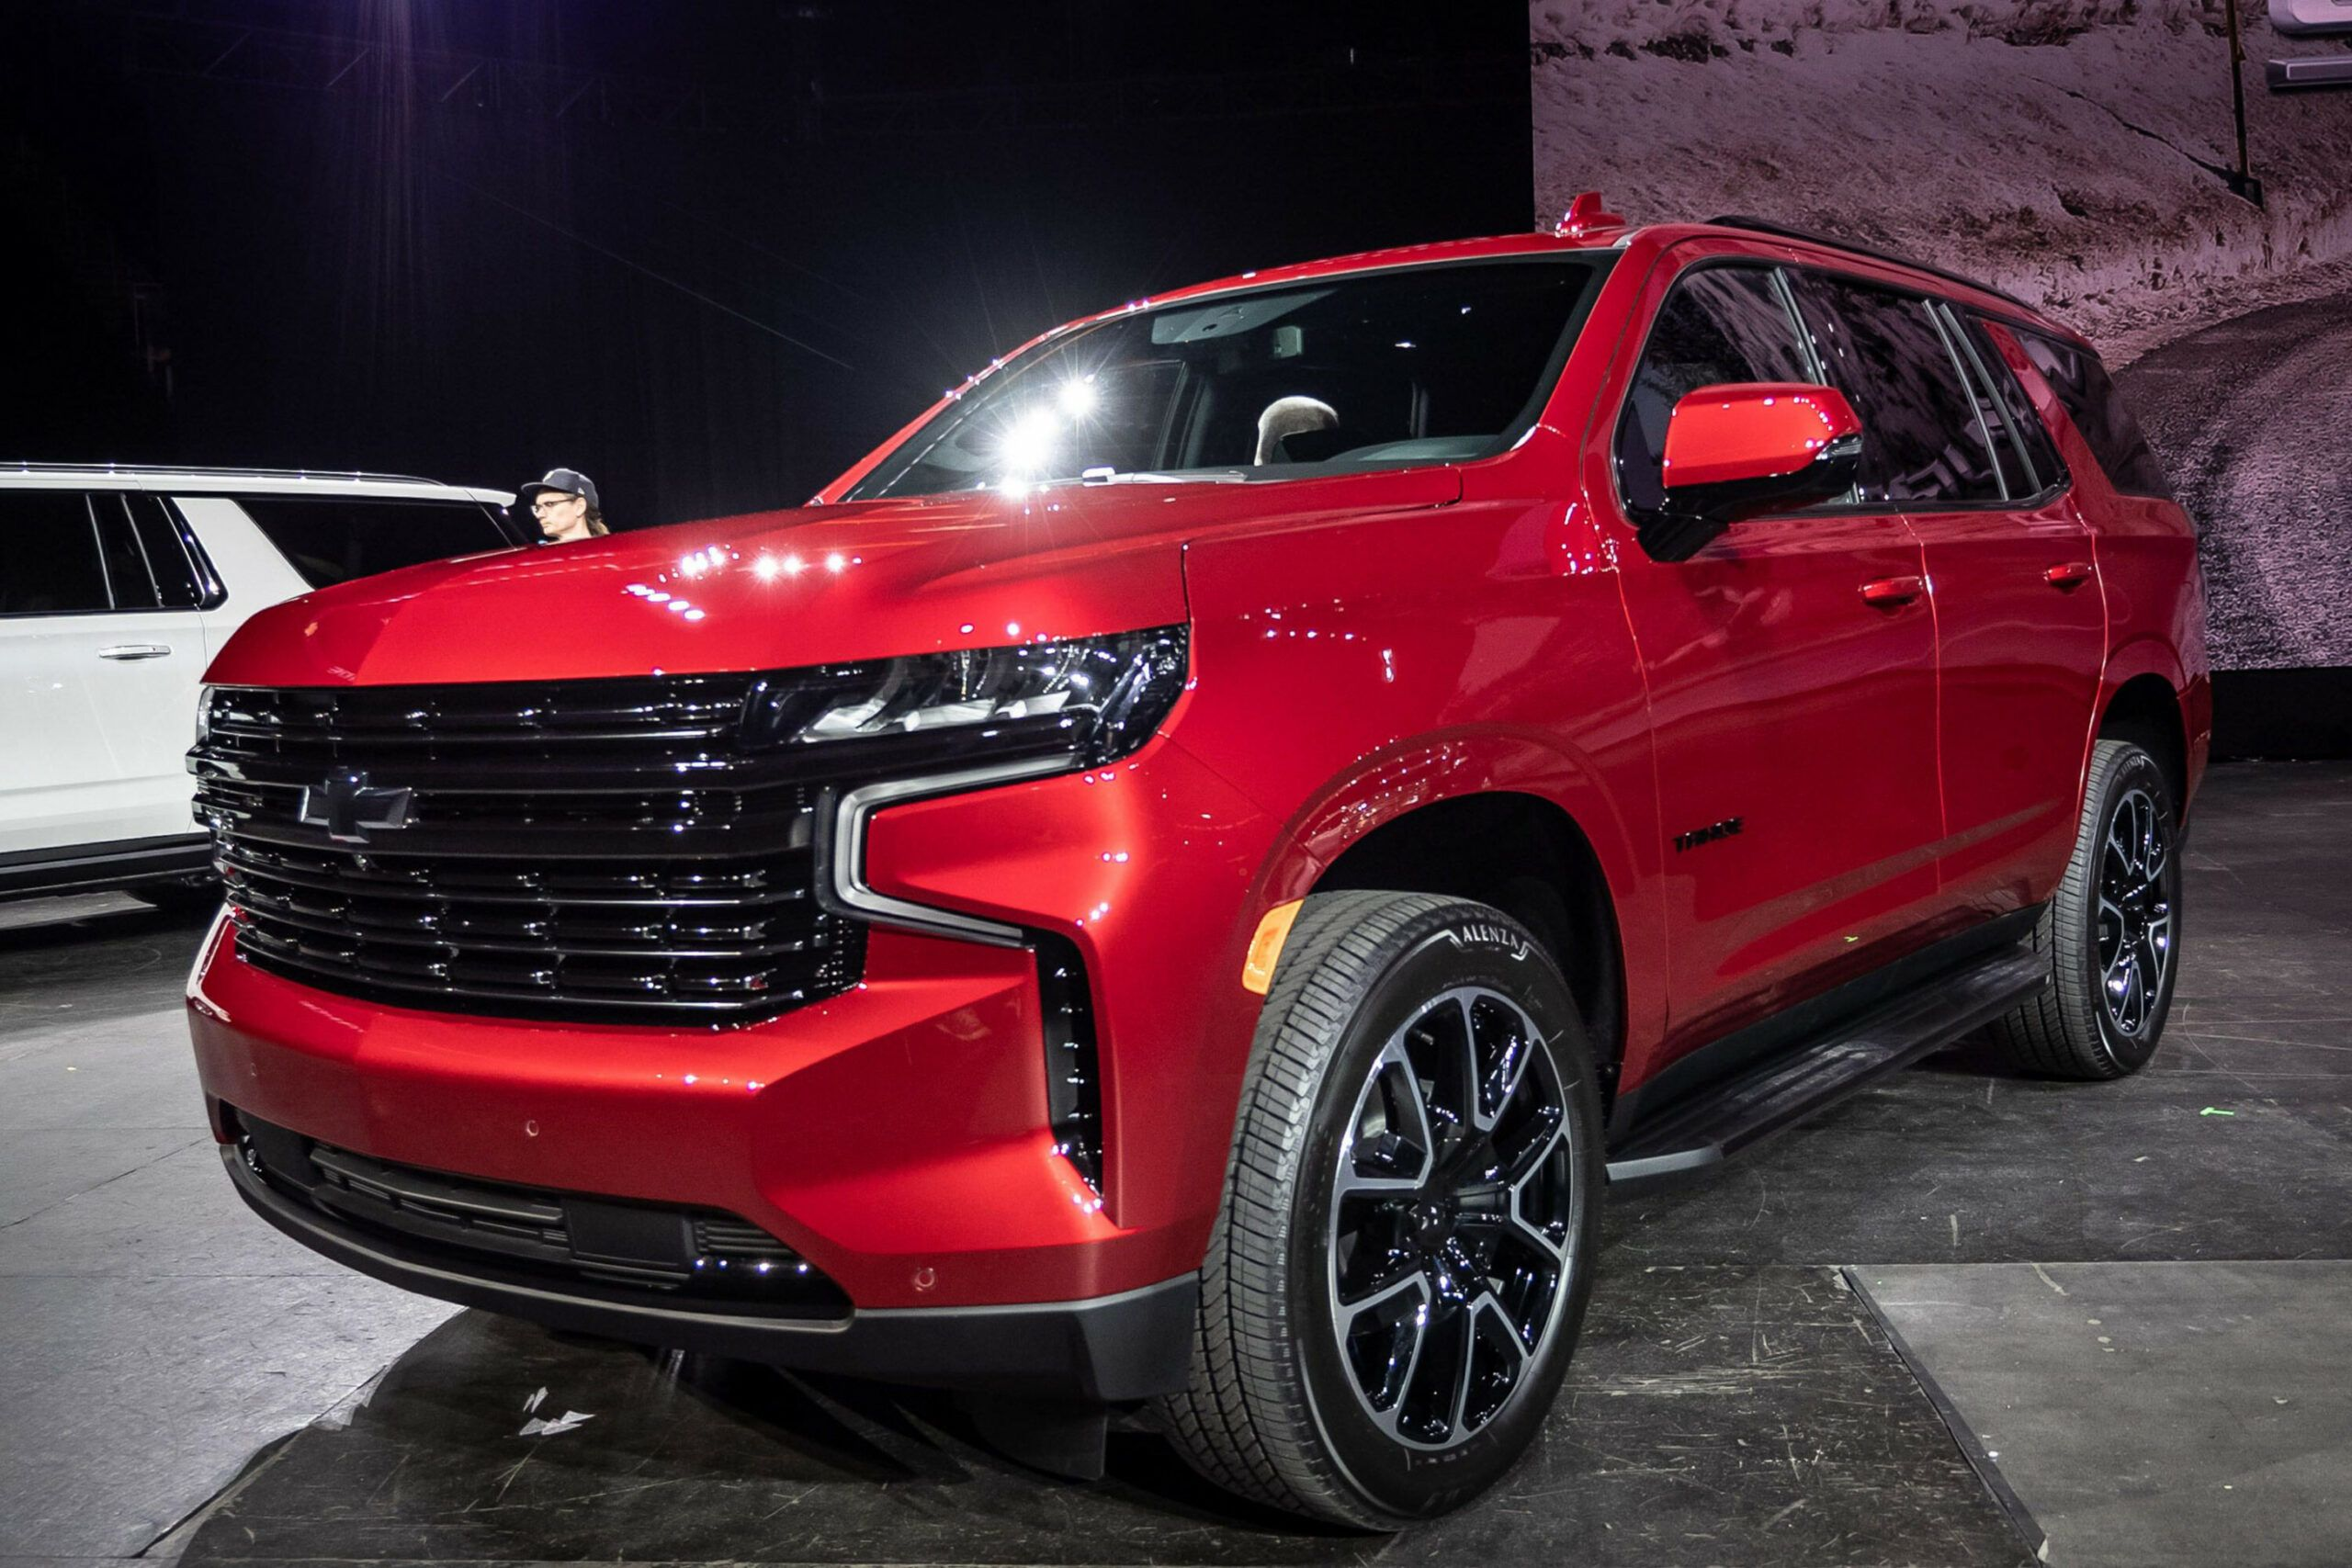 2020 Chevrolet Tahoe Redesign Rumors General Motors appear